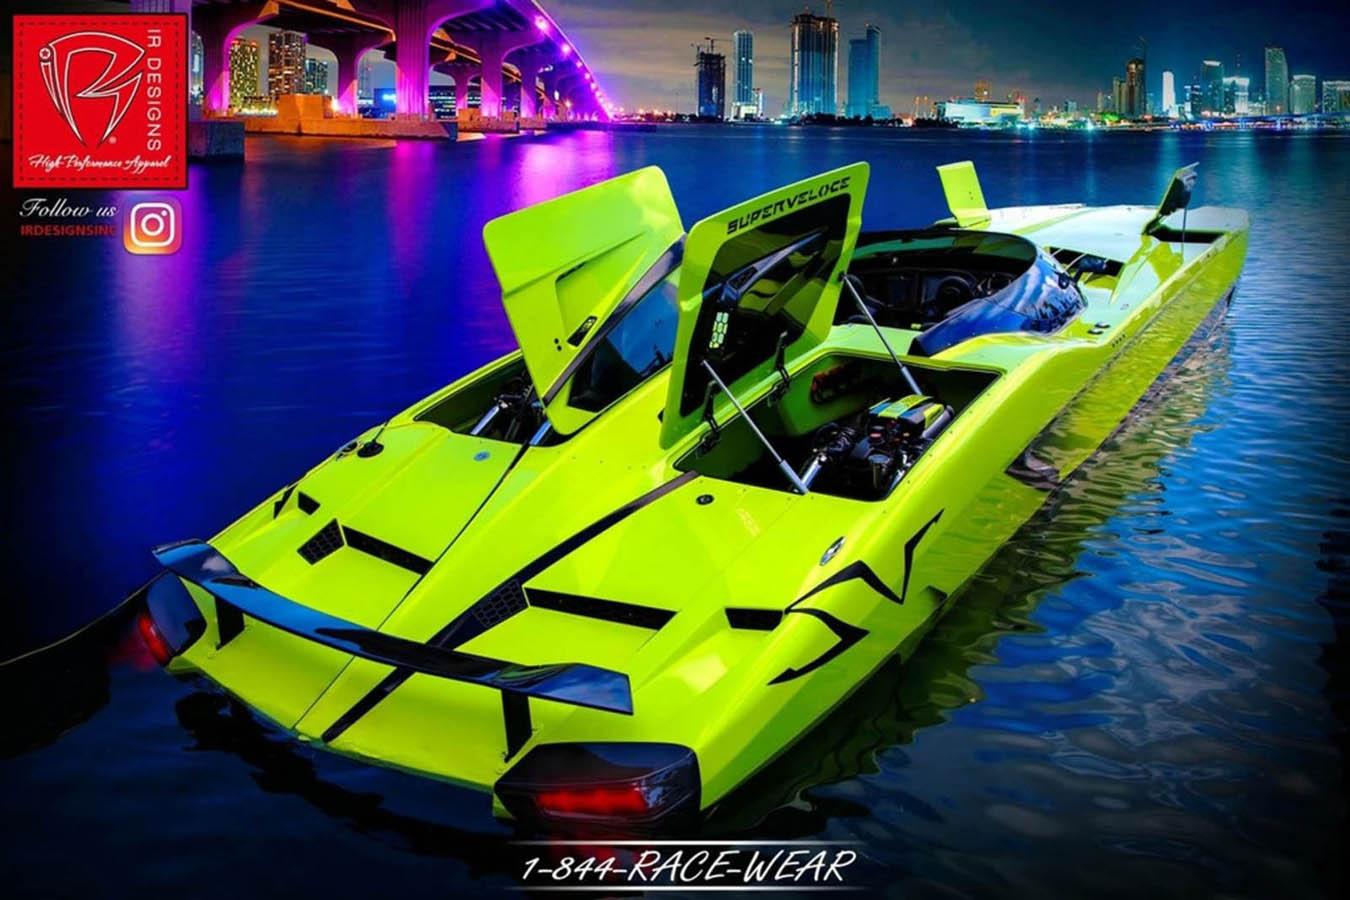 Lamborghini Aventador Boat 19 Jpeg موقع ويلز